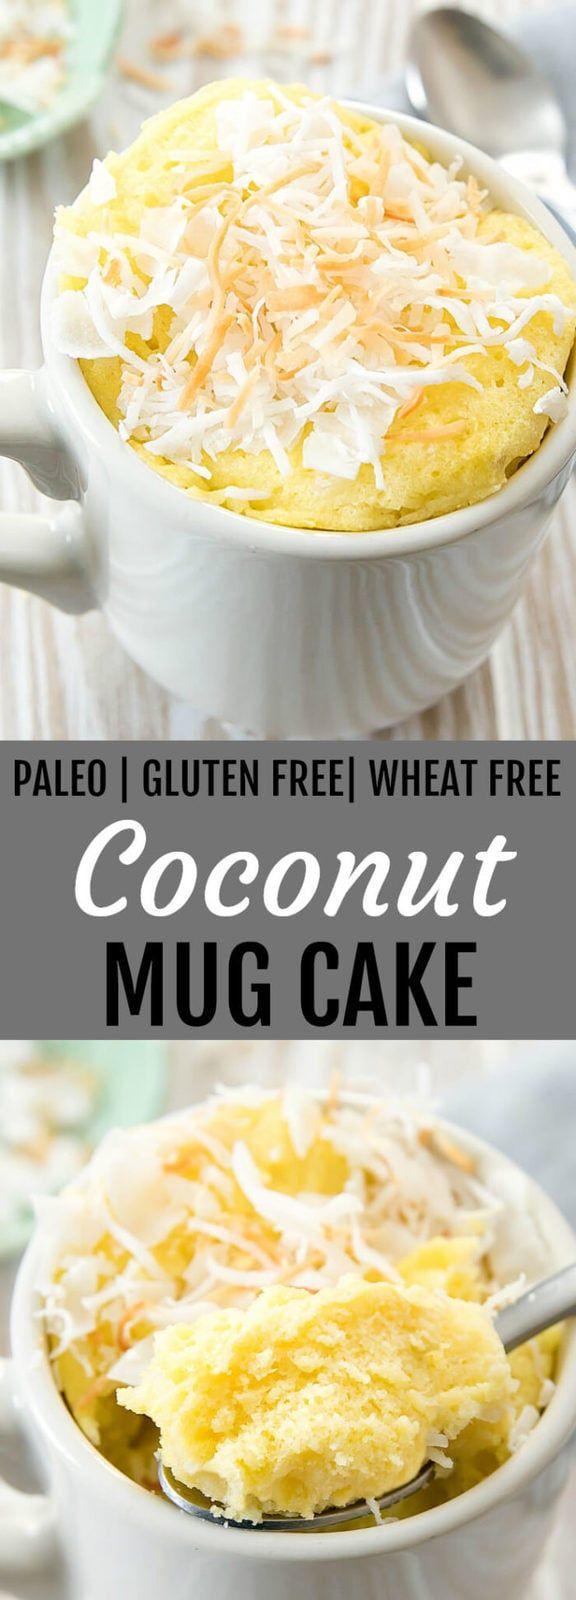 Coconut Mug Cake (Paleo, Gluten Free) #mugcake